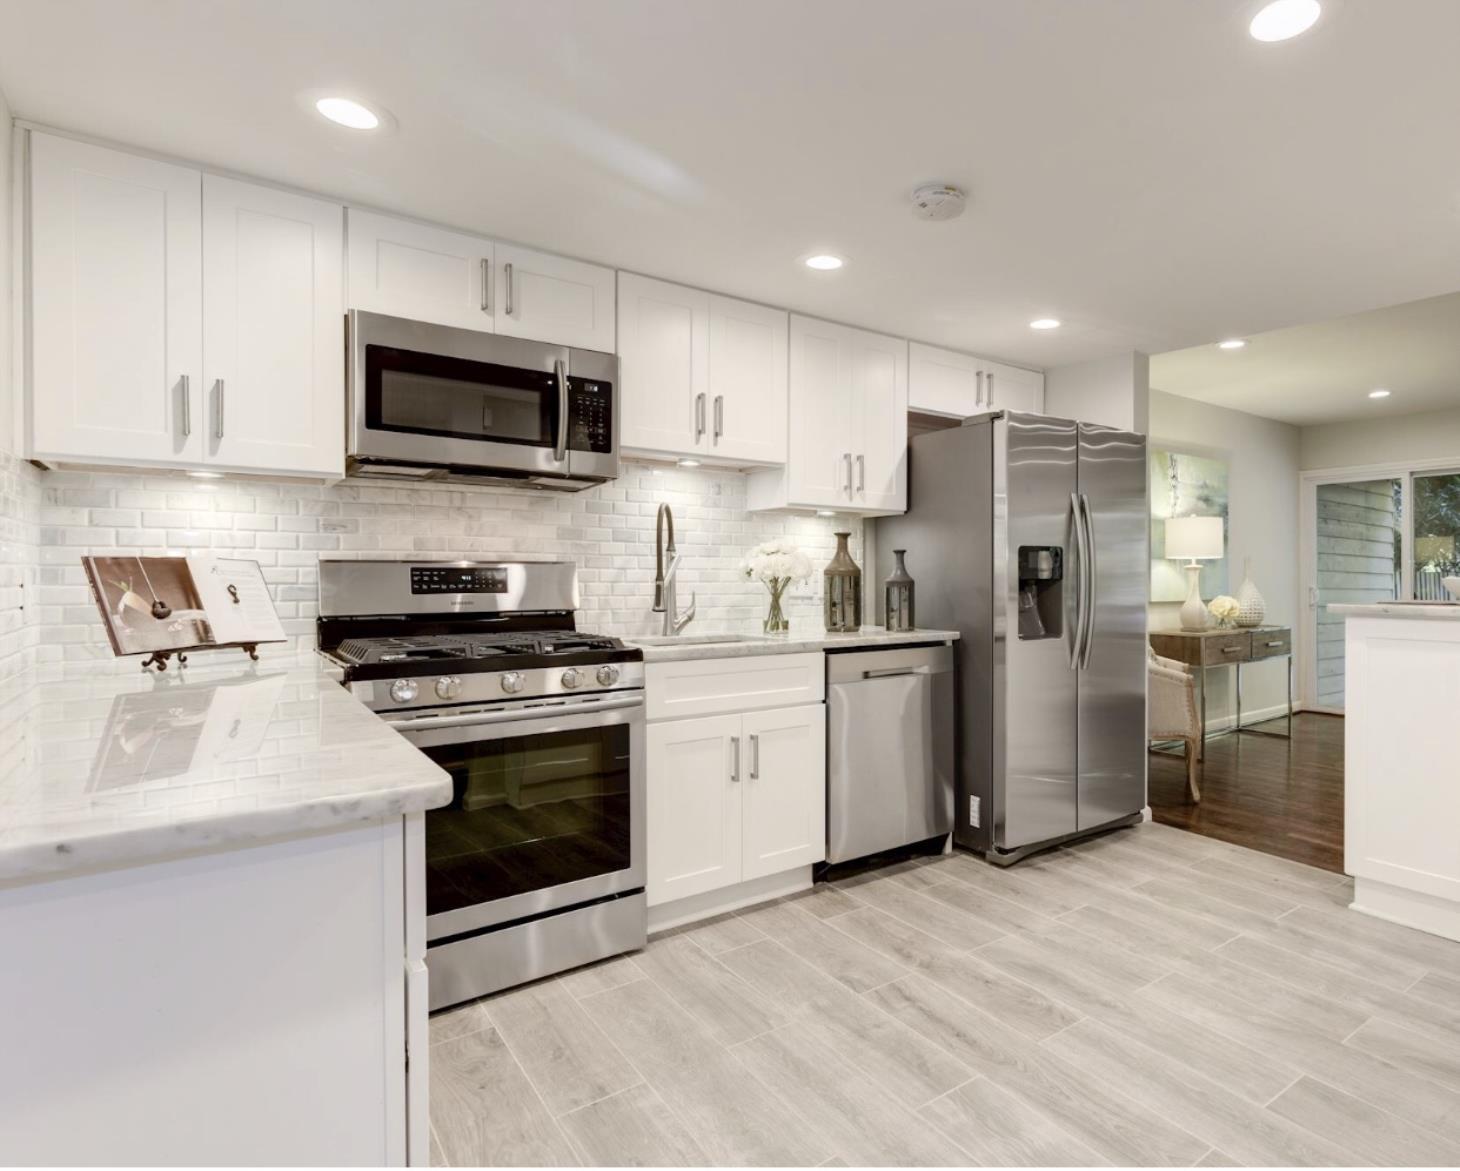 Virginia Home Design image 1